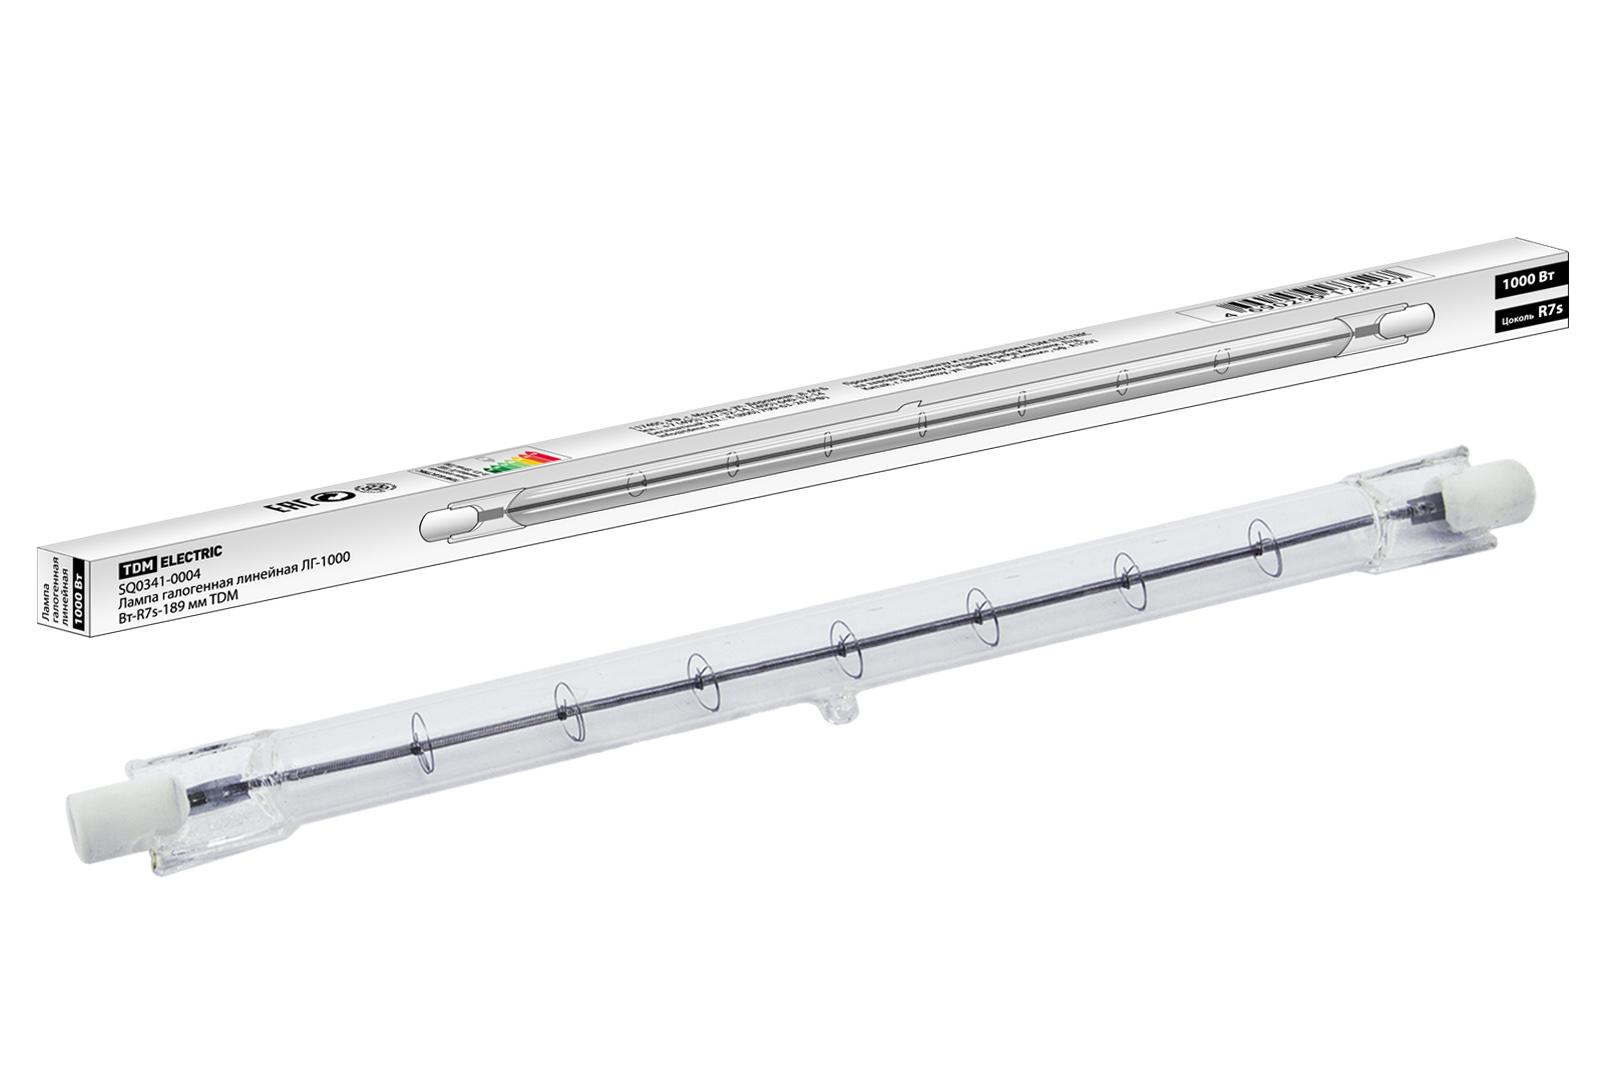 Фото Лампа галогенная линейная ЛГ-1000 Вт-R7s-189 мм TDM {SQ0341-0004}